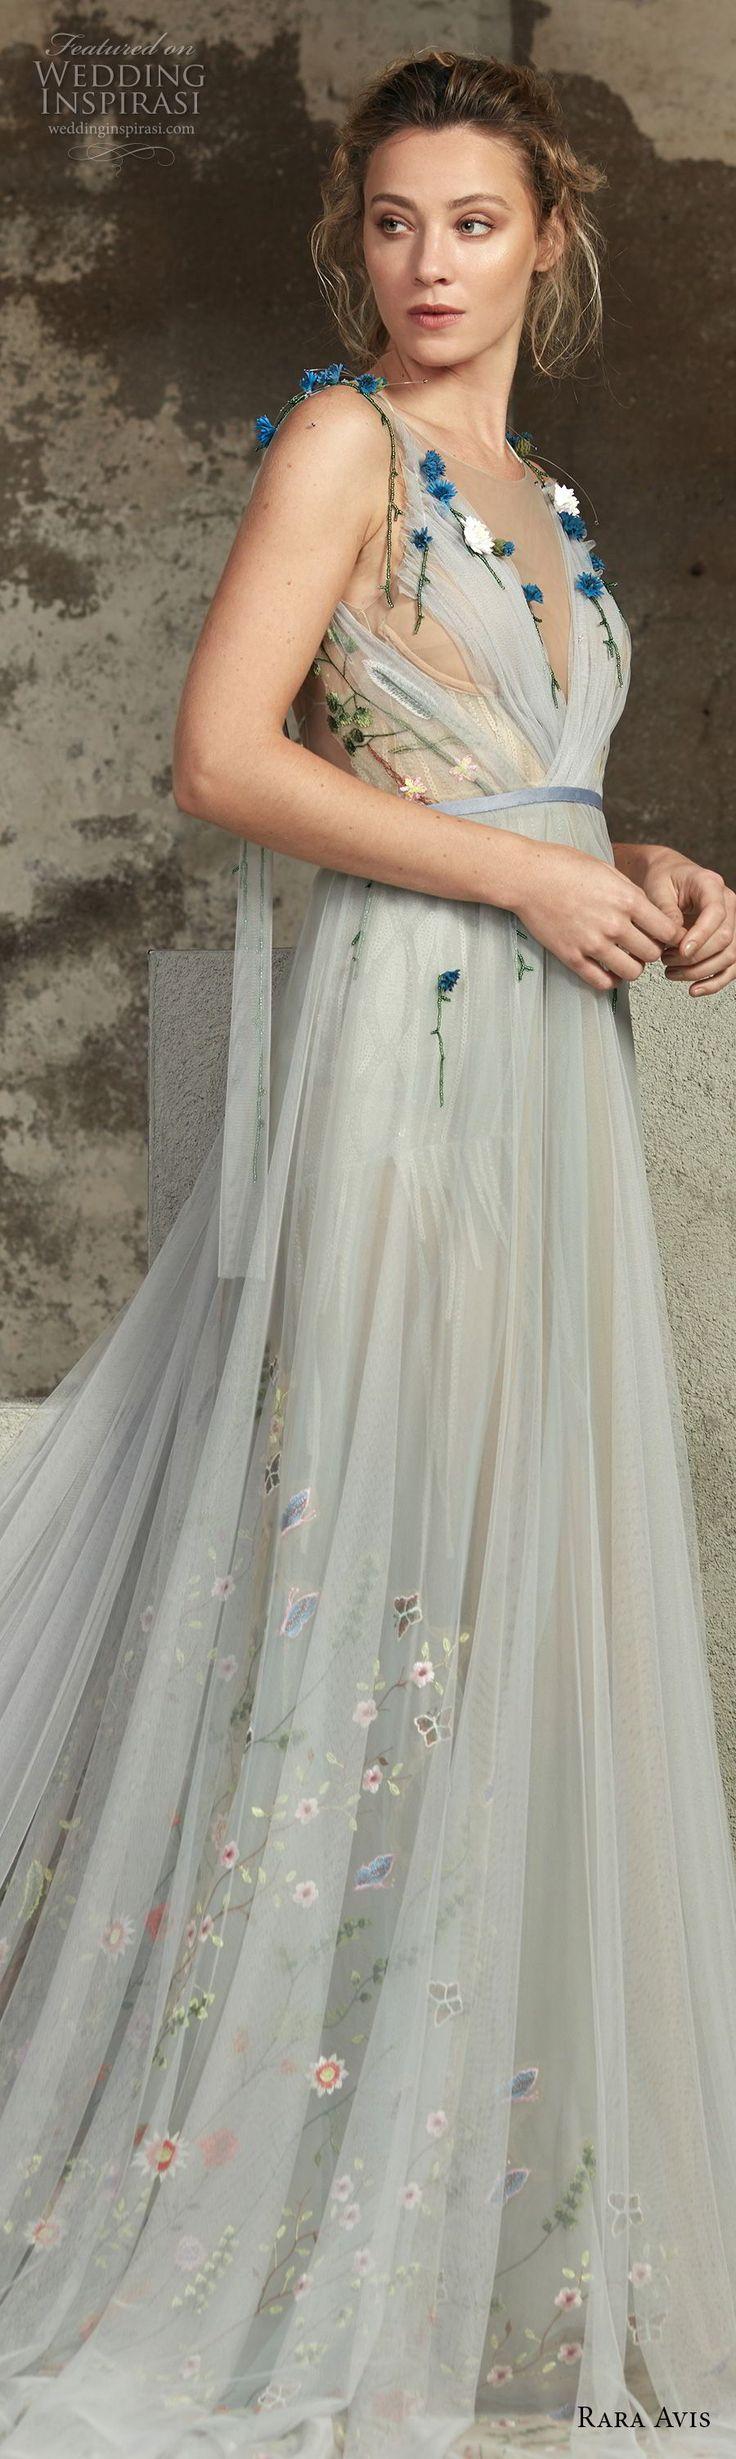 rara avis 2017 bridal sleeveless illusion bateau v neck lightly embellished romantic pastel blue tulle a  line wedding dress open back chapel train (12) sdv -- Rara Avis 2017 Wedding Dresses